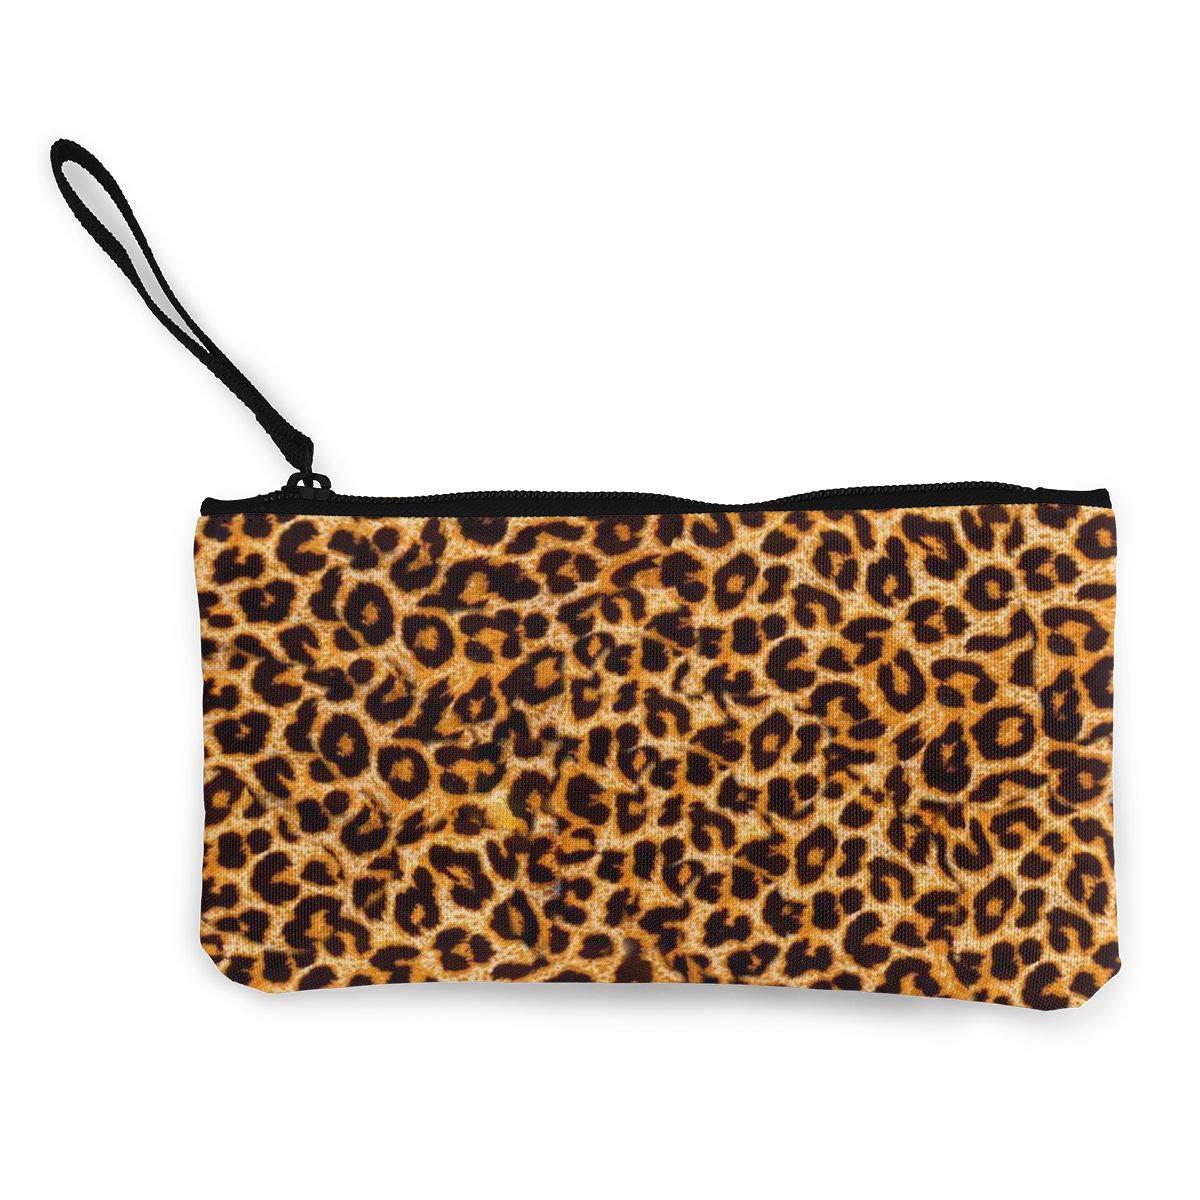 Make Up Bag TR7FD15DE Leopard Print Zipper Canvas Coin Purse Wallet Cellphone Bag With Handle